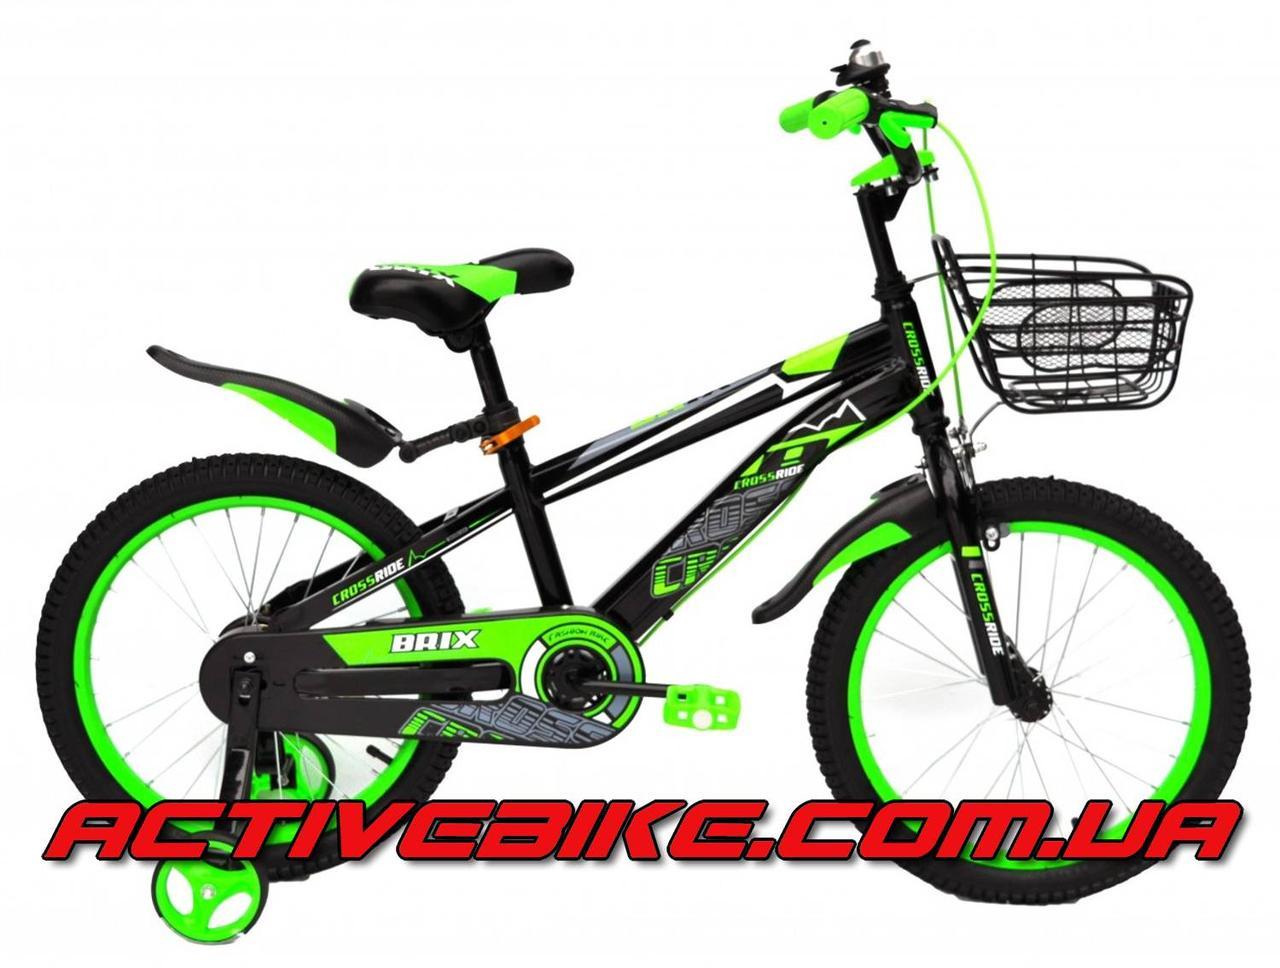 9dfc316496df8e Детский велосипед Crossride BRIX 18